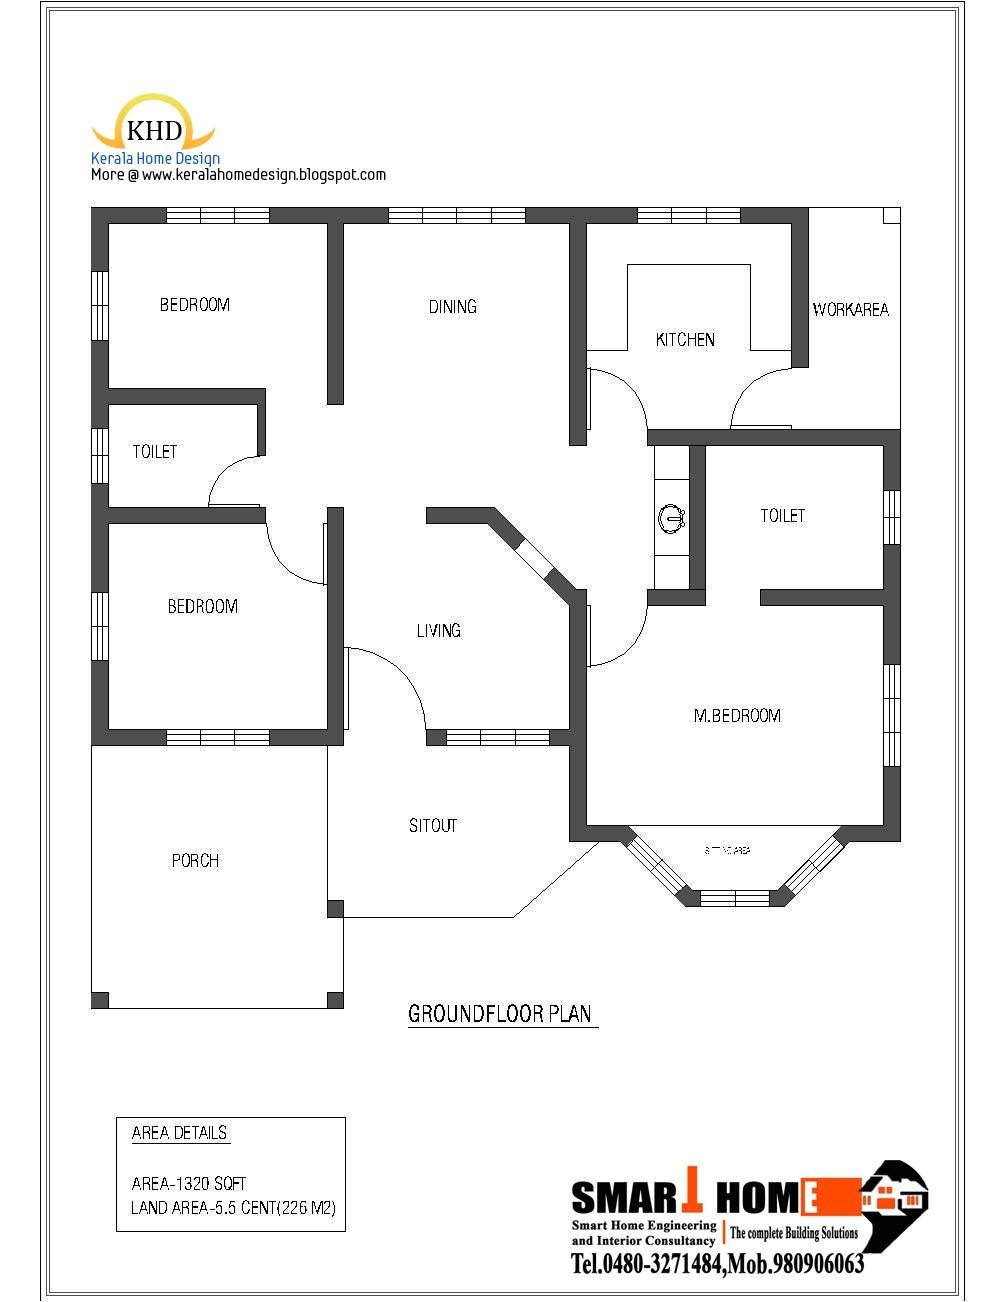 ground floor plan for home unique 48 single floor house plans house plan house plans floor plans